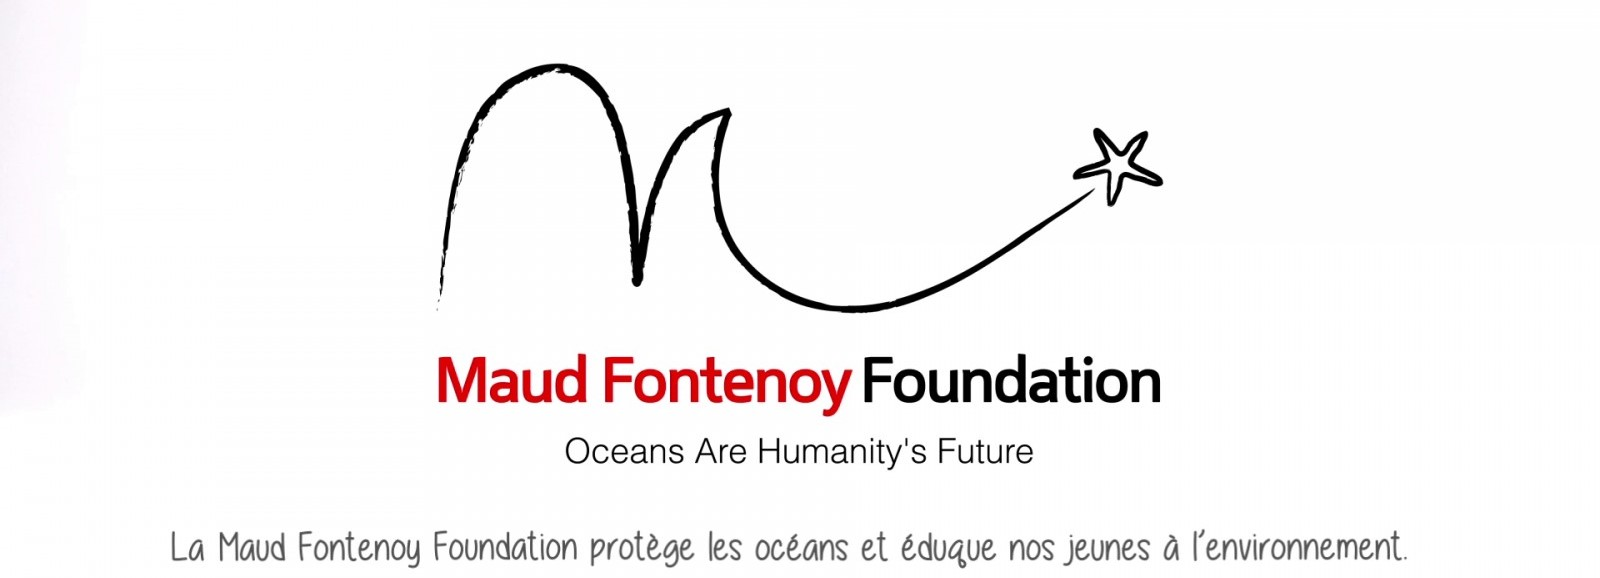 maud-fontenoy-foundation